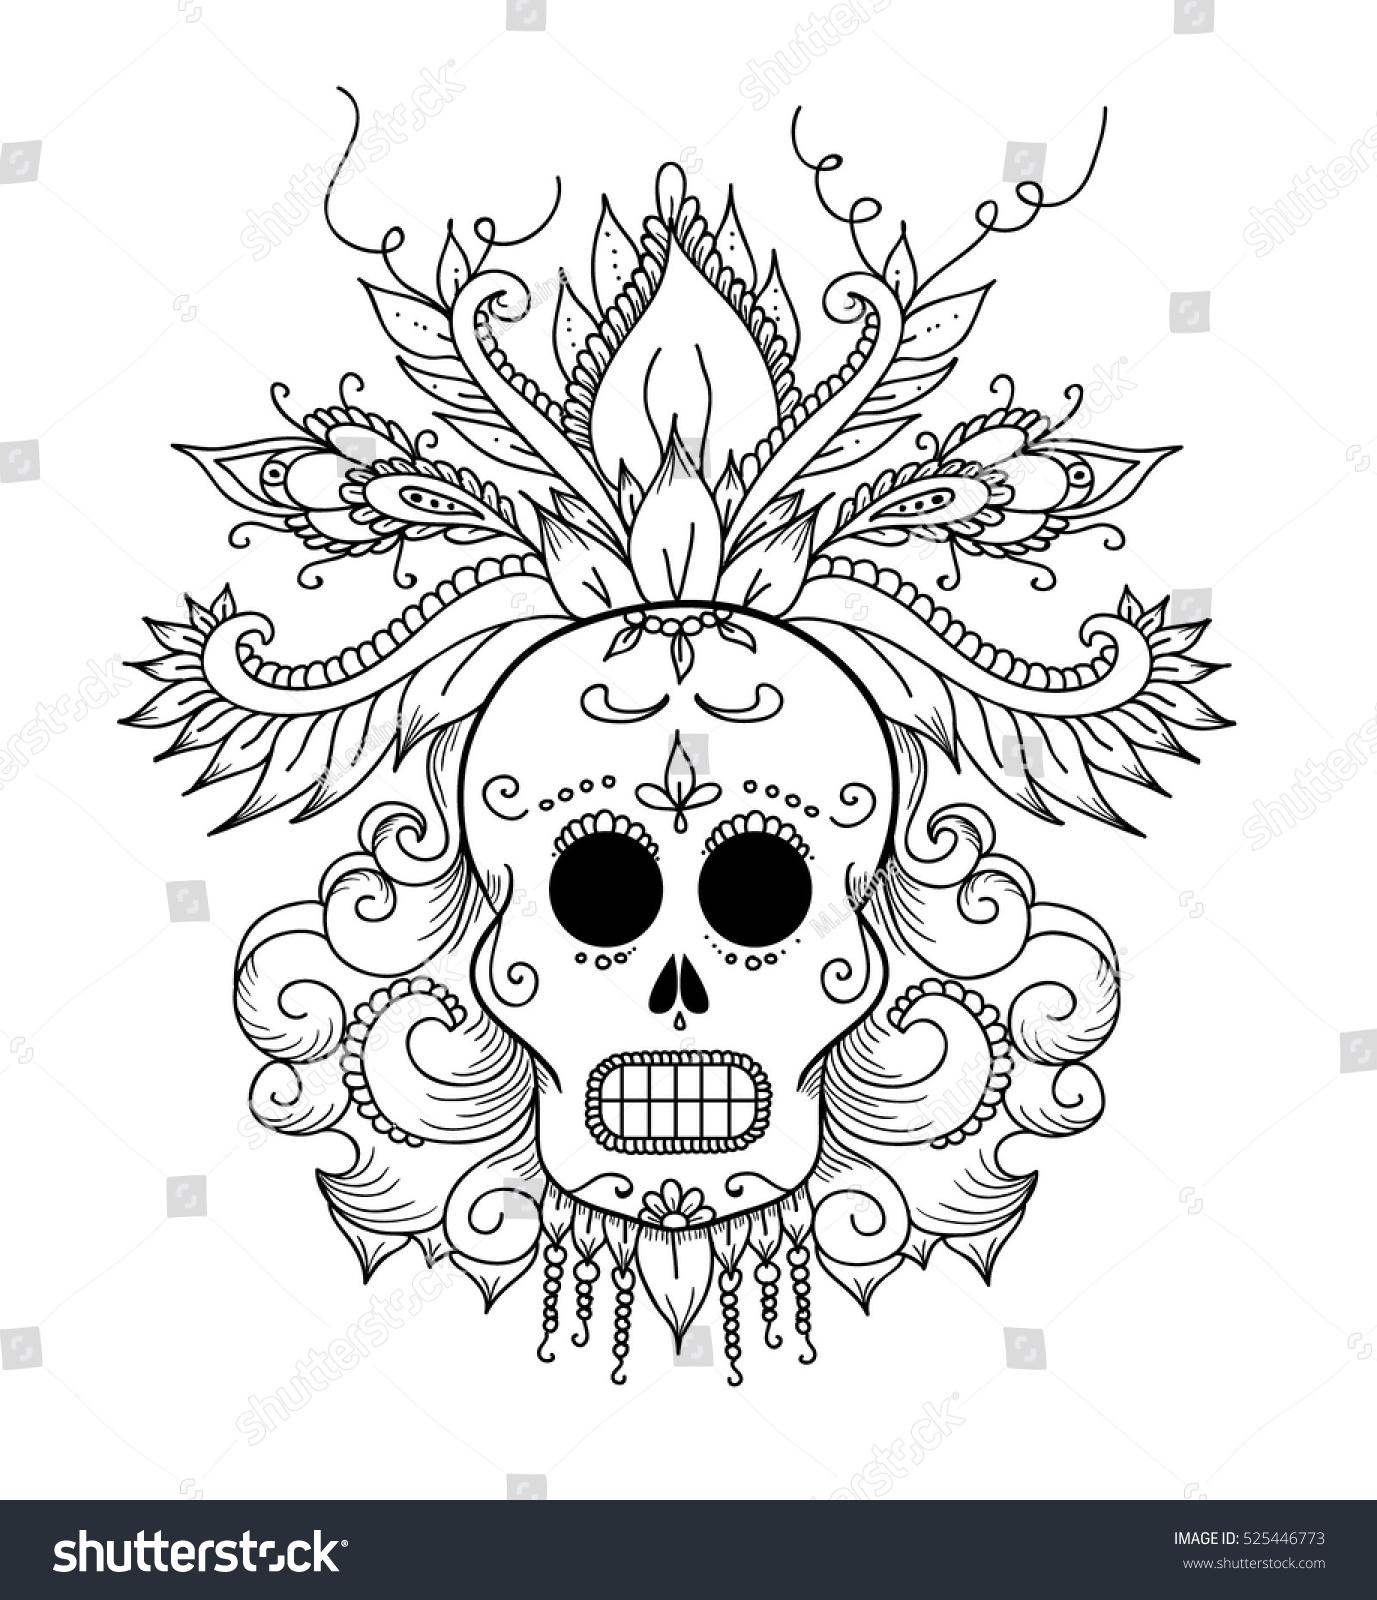 Dia De Los Muertos Colouring Book Stock Vector 525446773 - Shutterstock